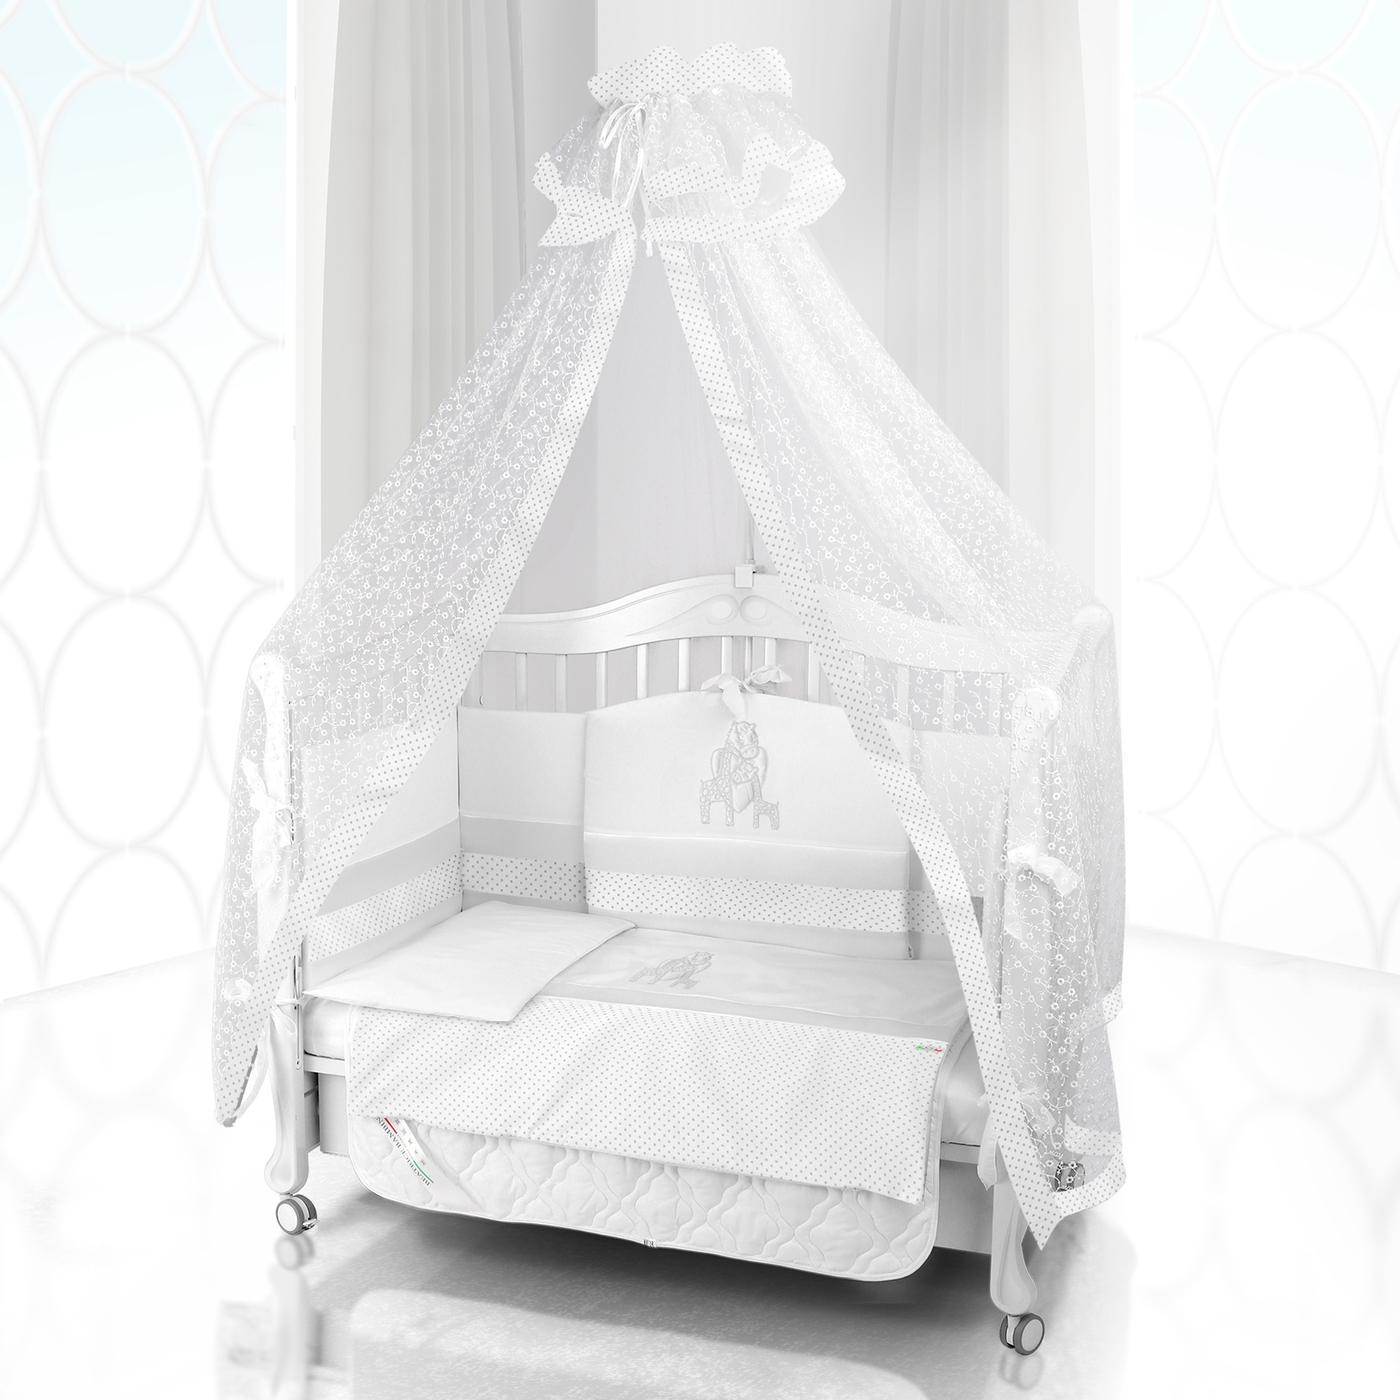 Комплект постельного белья Beatrice Bambini Unico Punto Di Giraffa (125х65) - bianco/bianco